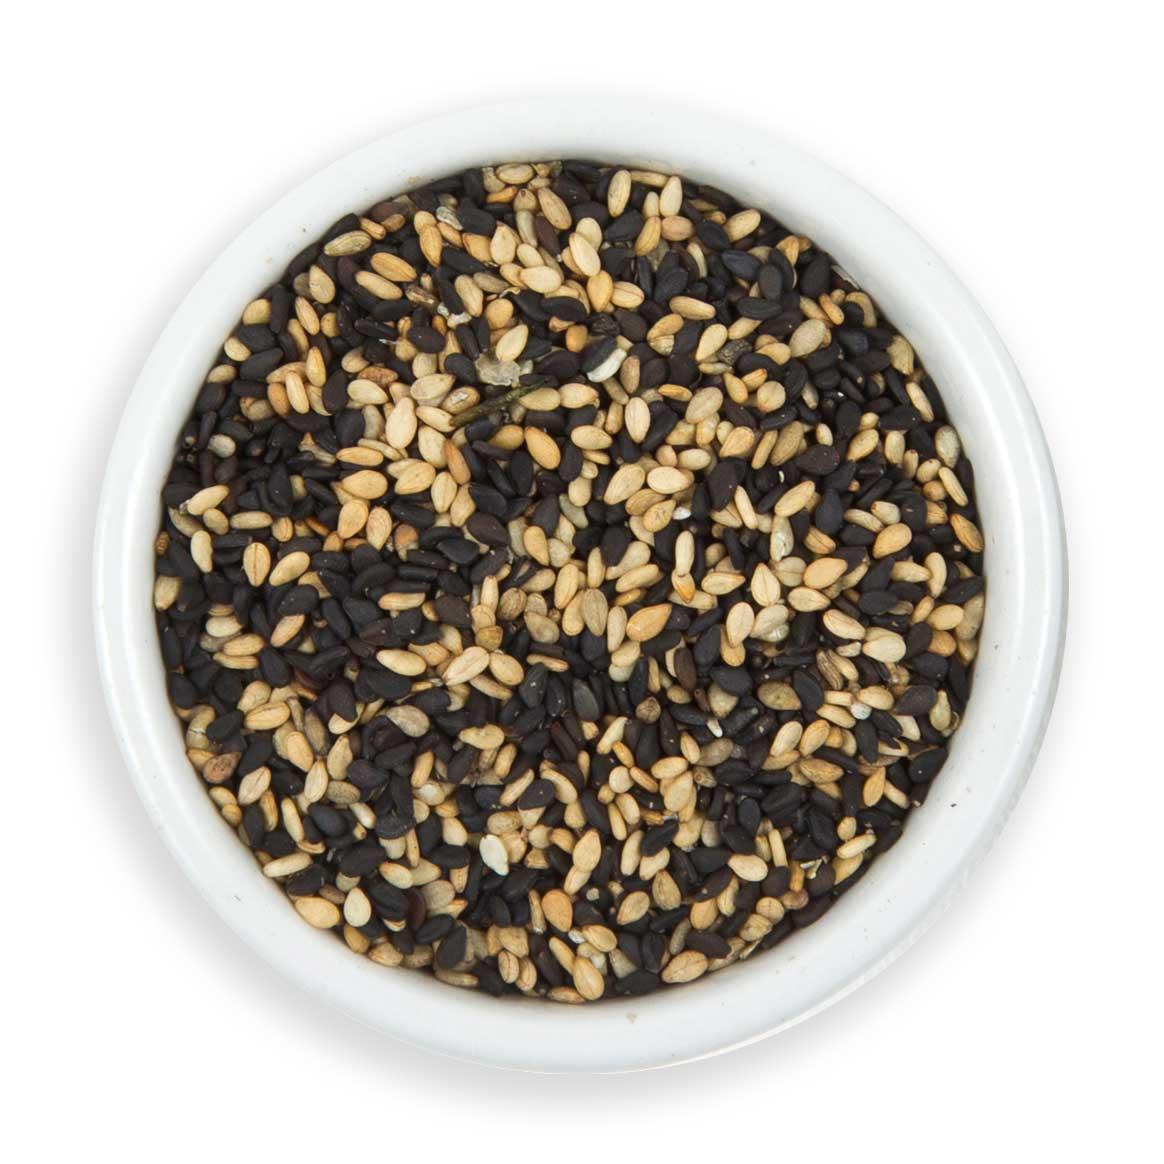 Mixed Sesame Seeds